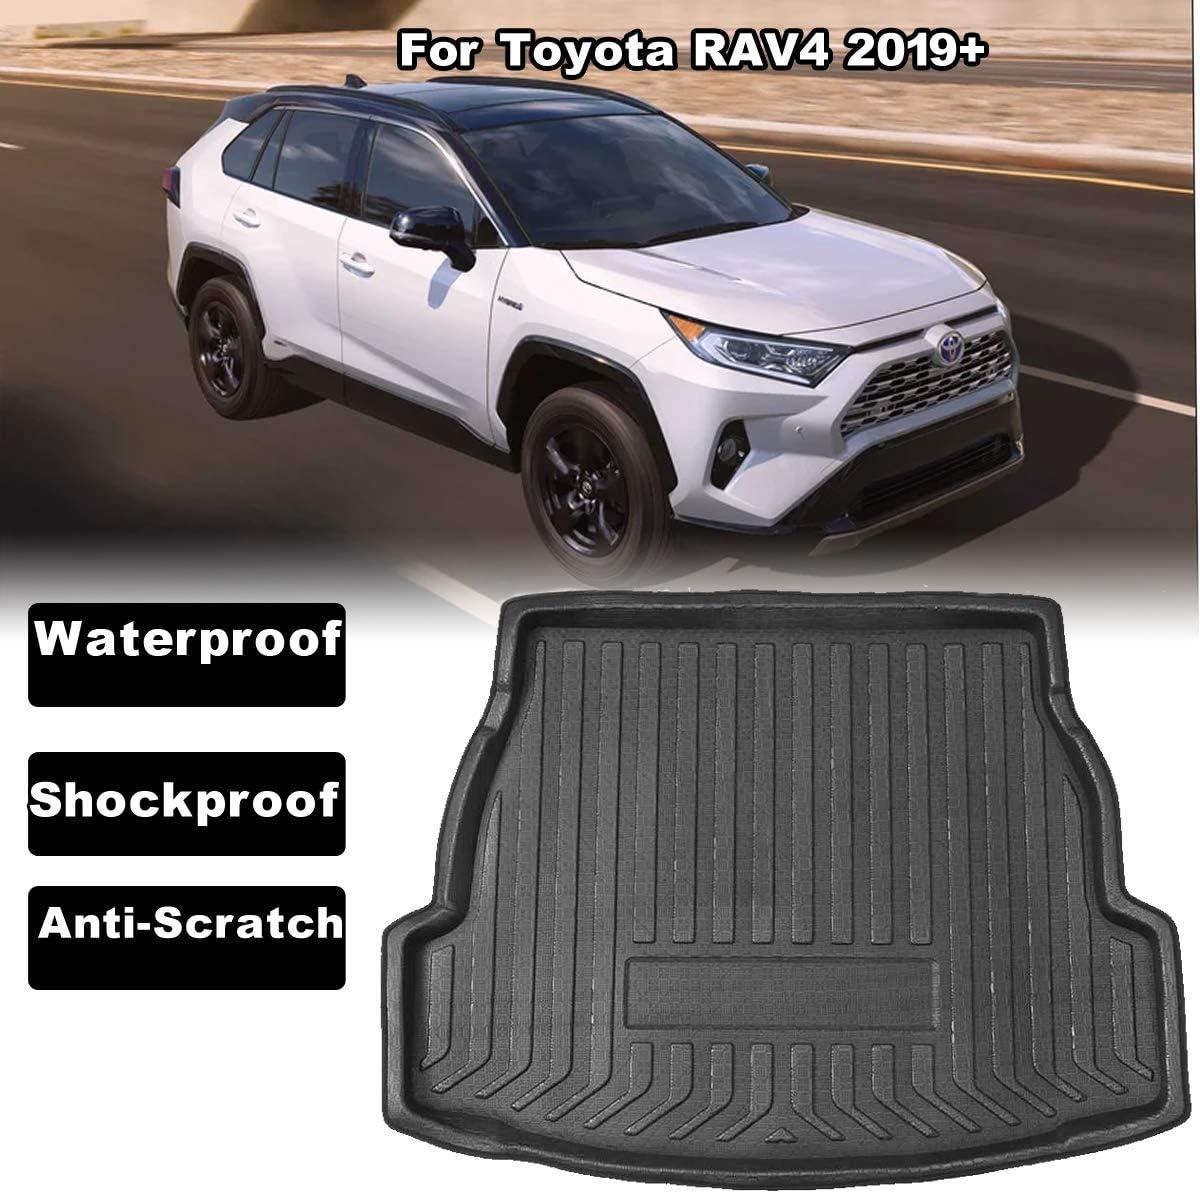 2006-2012 Los Tapetes de Goma Impermeables Brindan Protecci/óN contra Todo Clima Maletero Extrem//Alfombrilla para Maletero para La Modificaci/óN del Tronco del Toyota Rav4